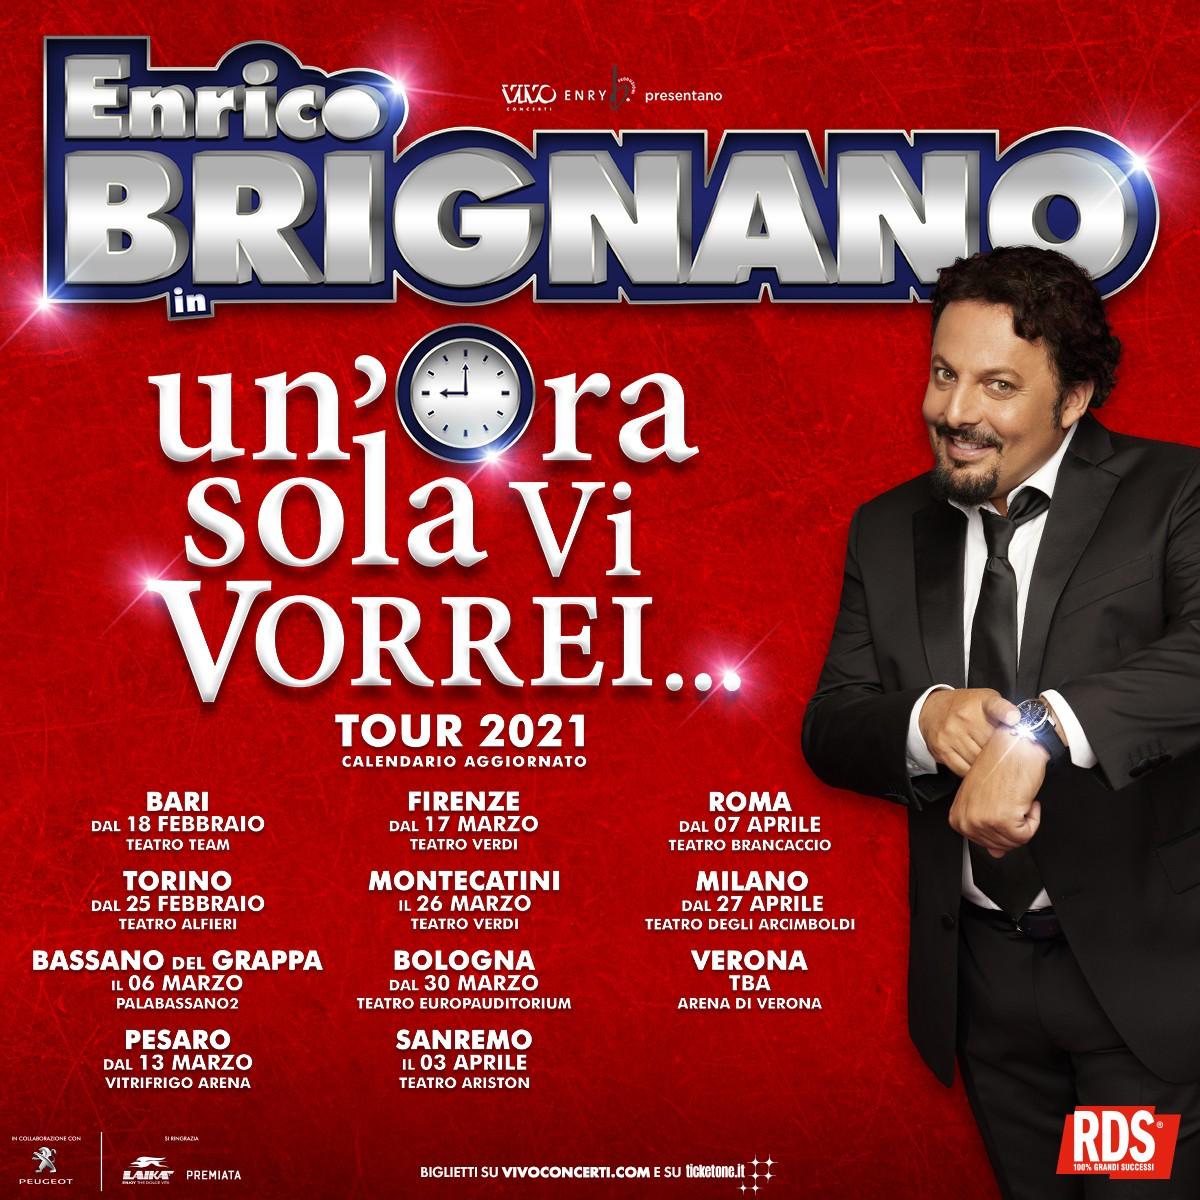 Enrico Brignano 2021